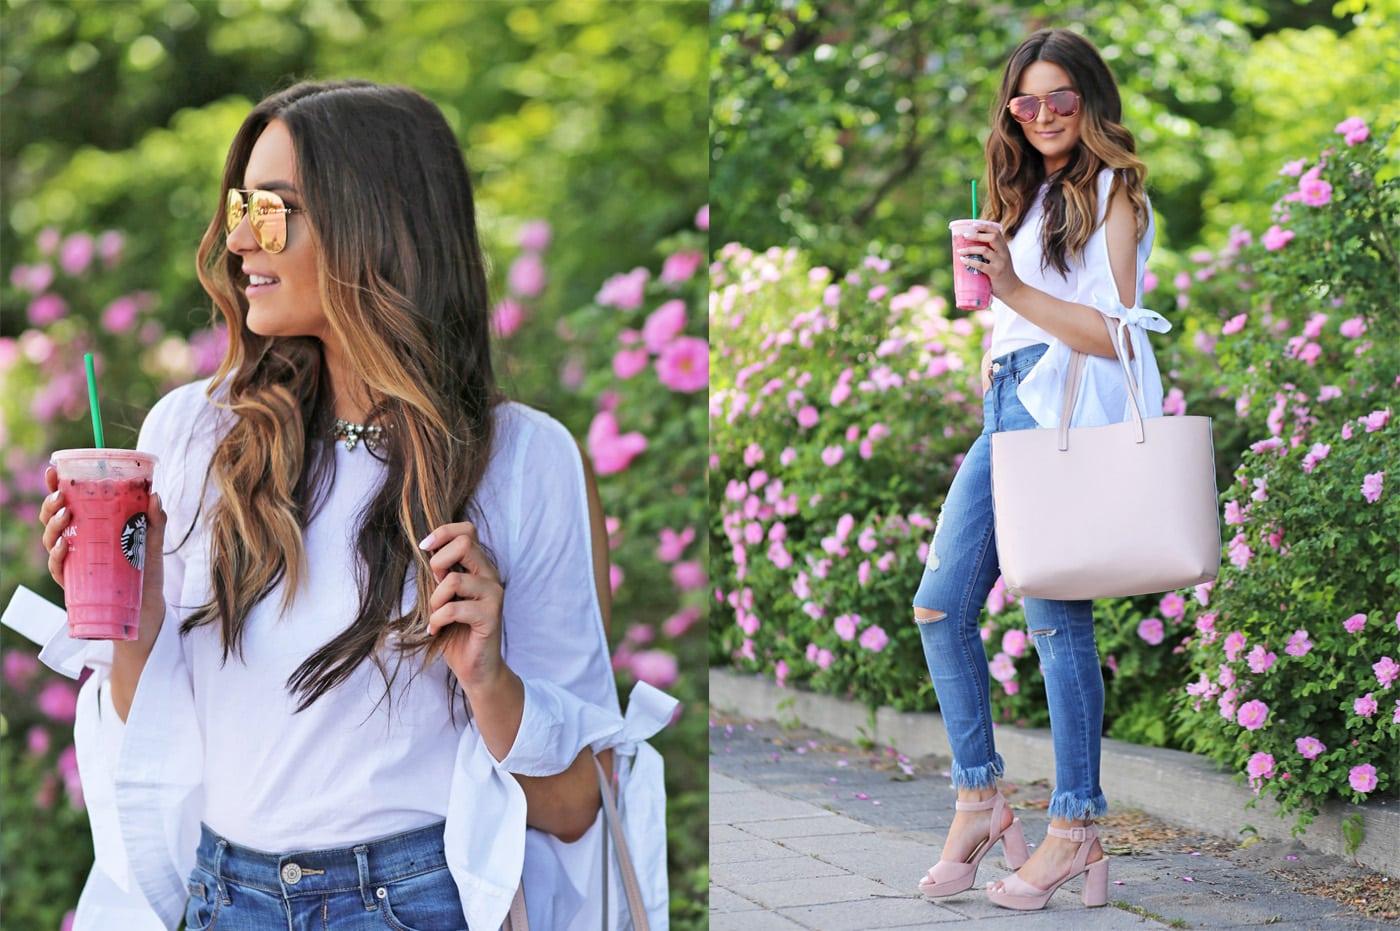 Michelle, Mash Elle Orlando beauty blogger